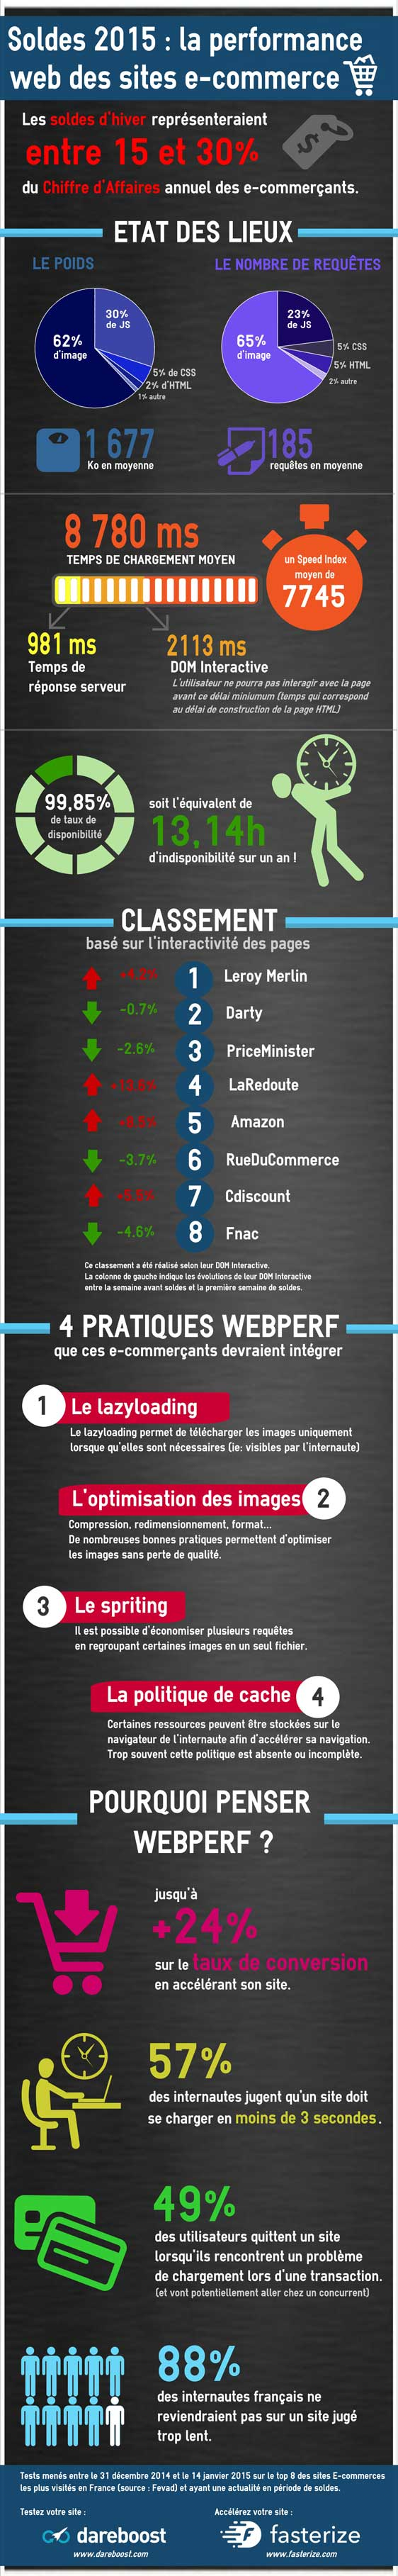 soldesperformance-VF-infographie